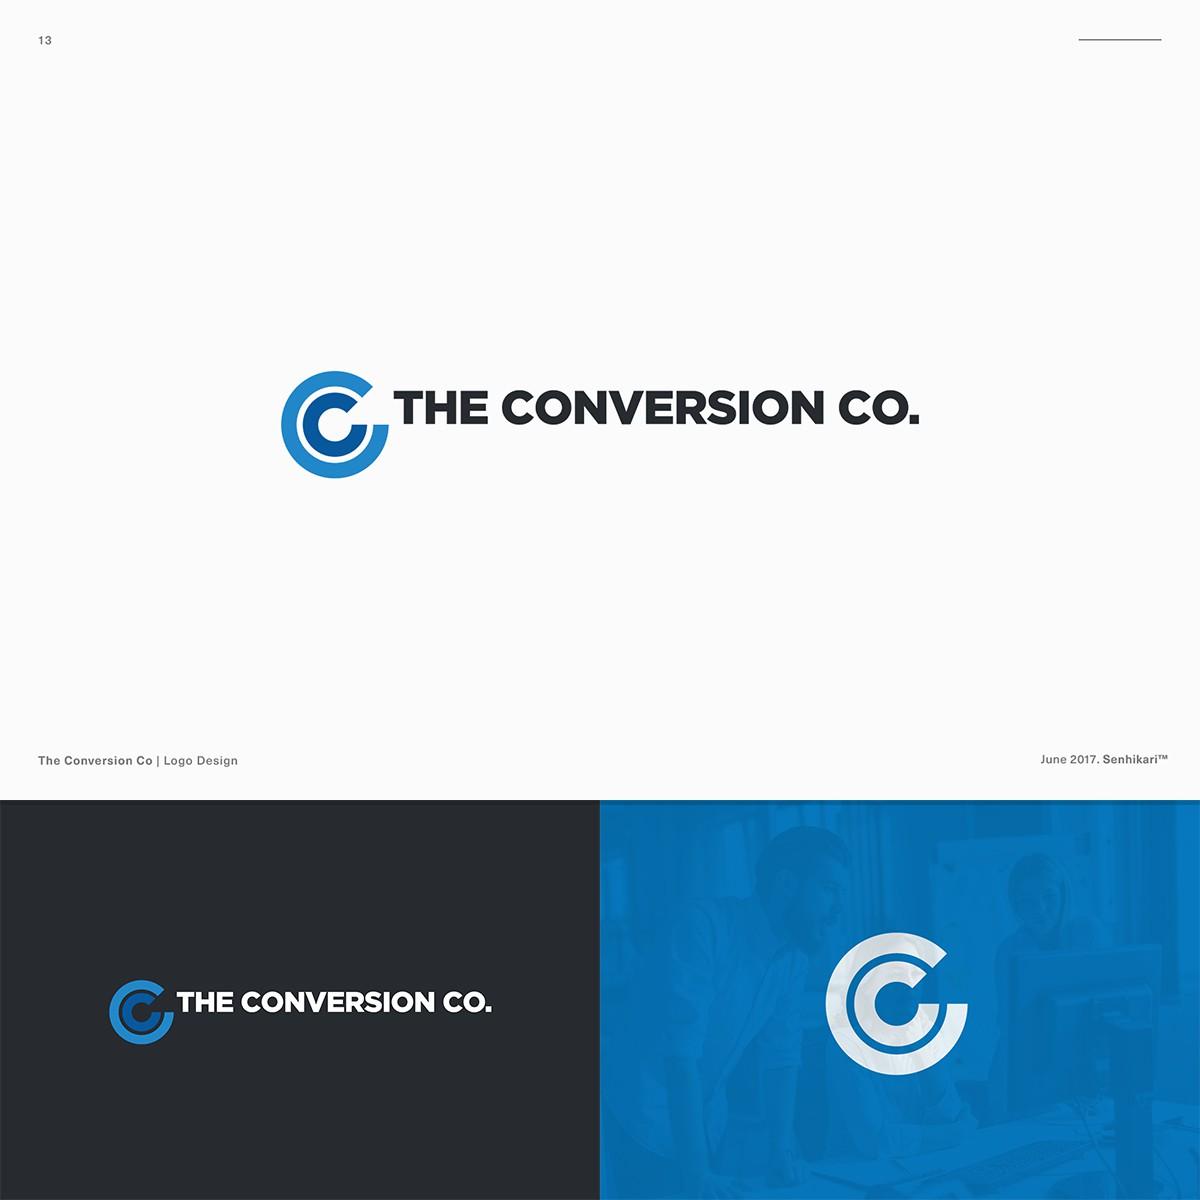 The Conversion Company